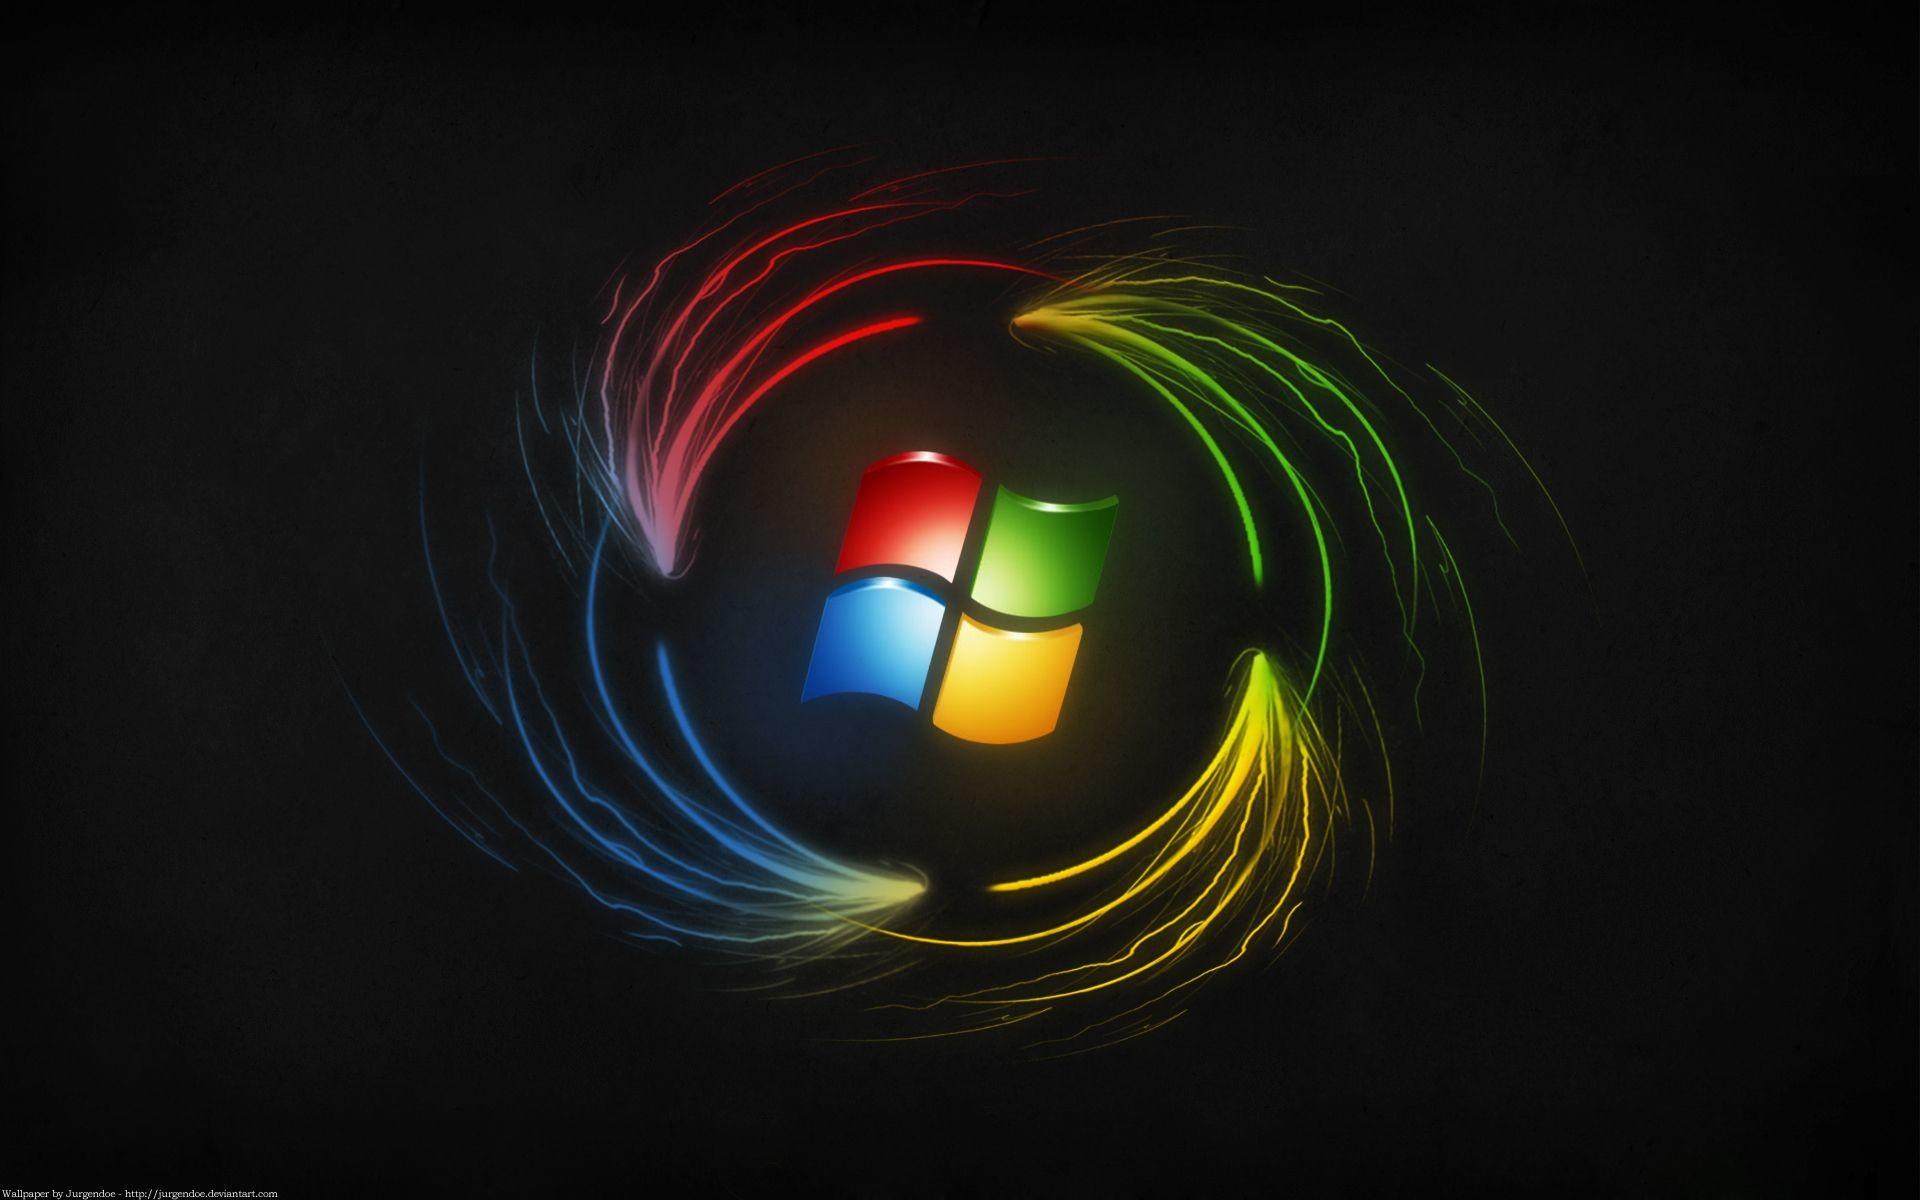 1920x1080 Best 25 Windows 10 Desktop Backgrounds Ideas On Pinterest